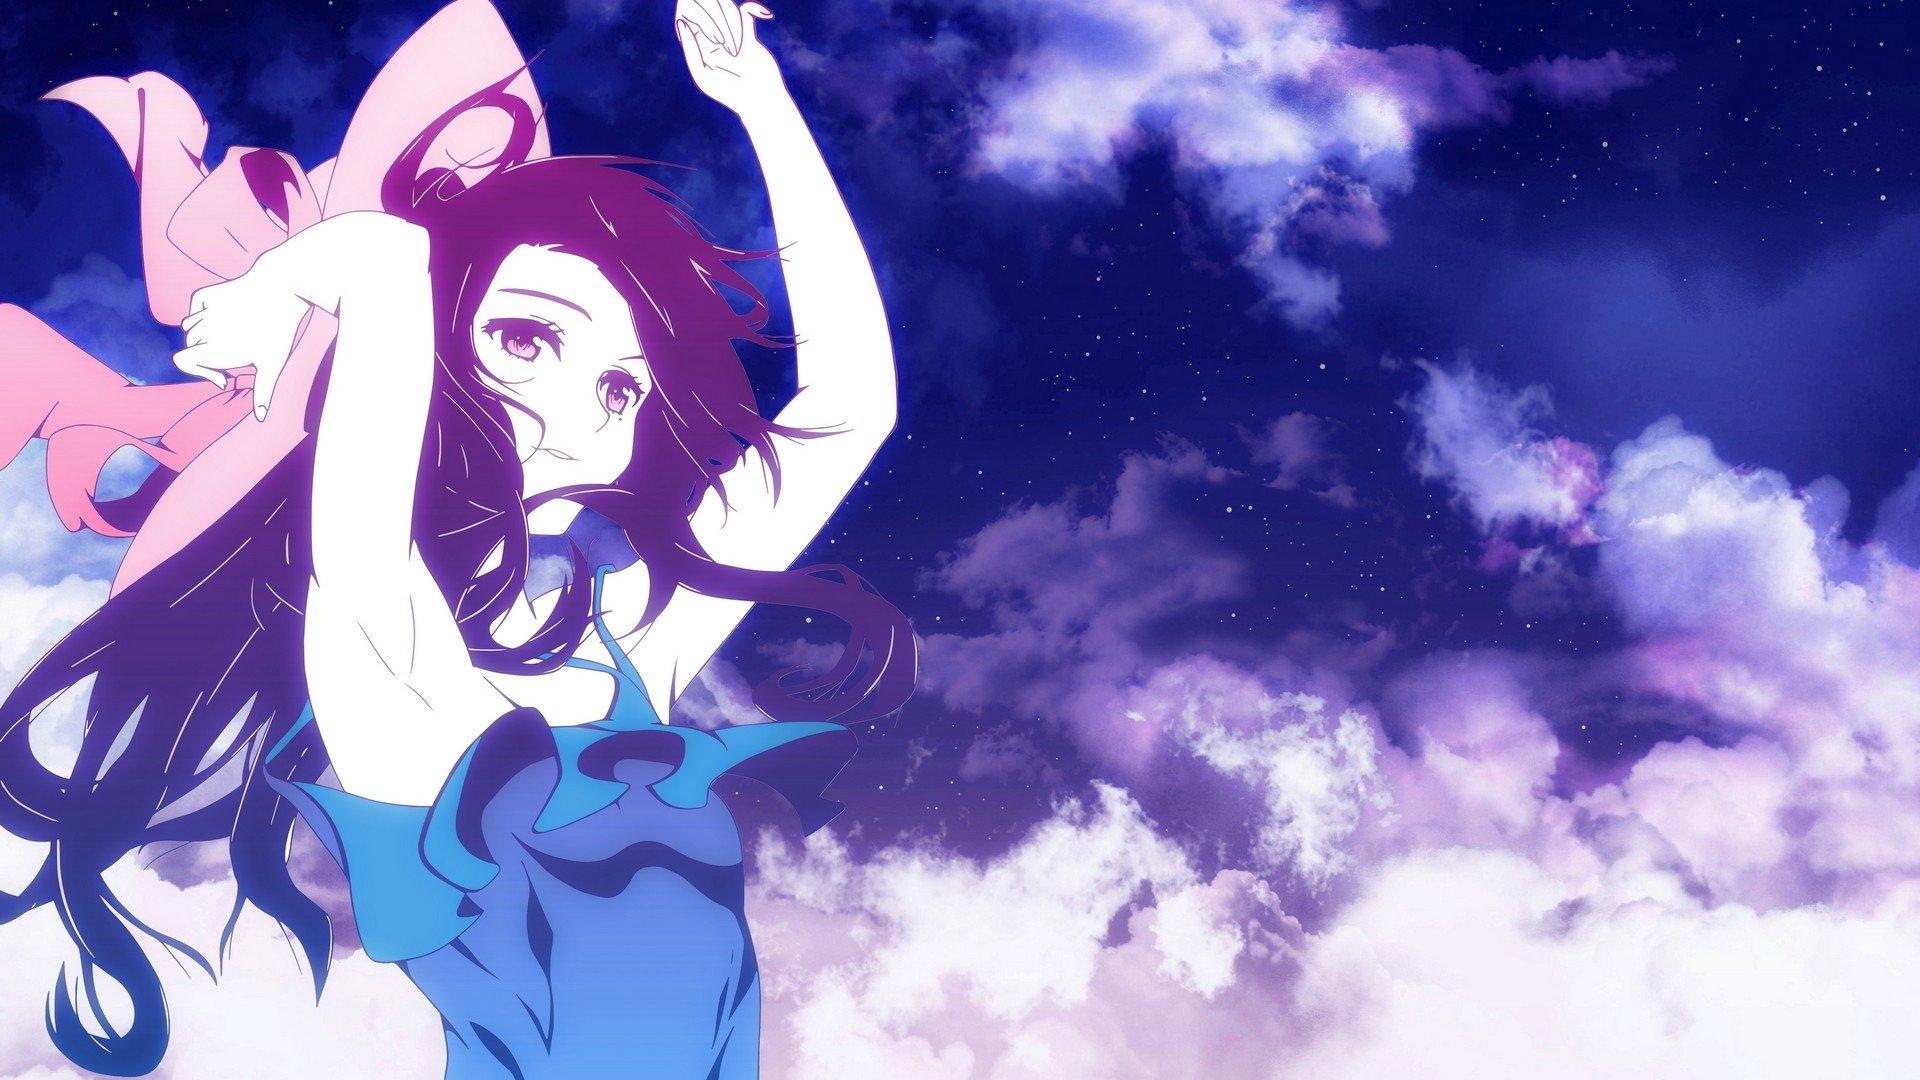 1920x1080 px digital anime art haruka